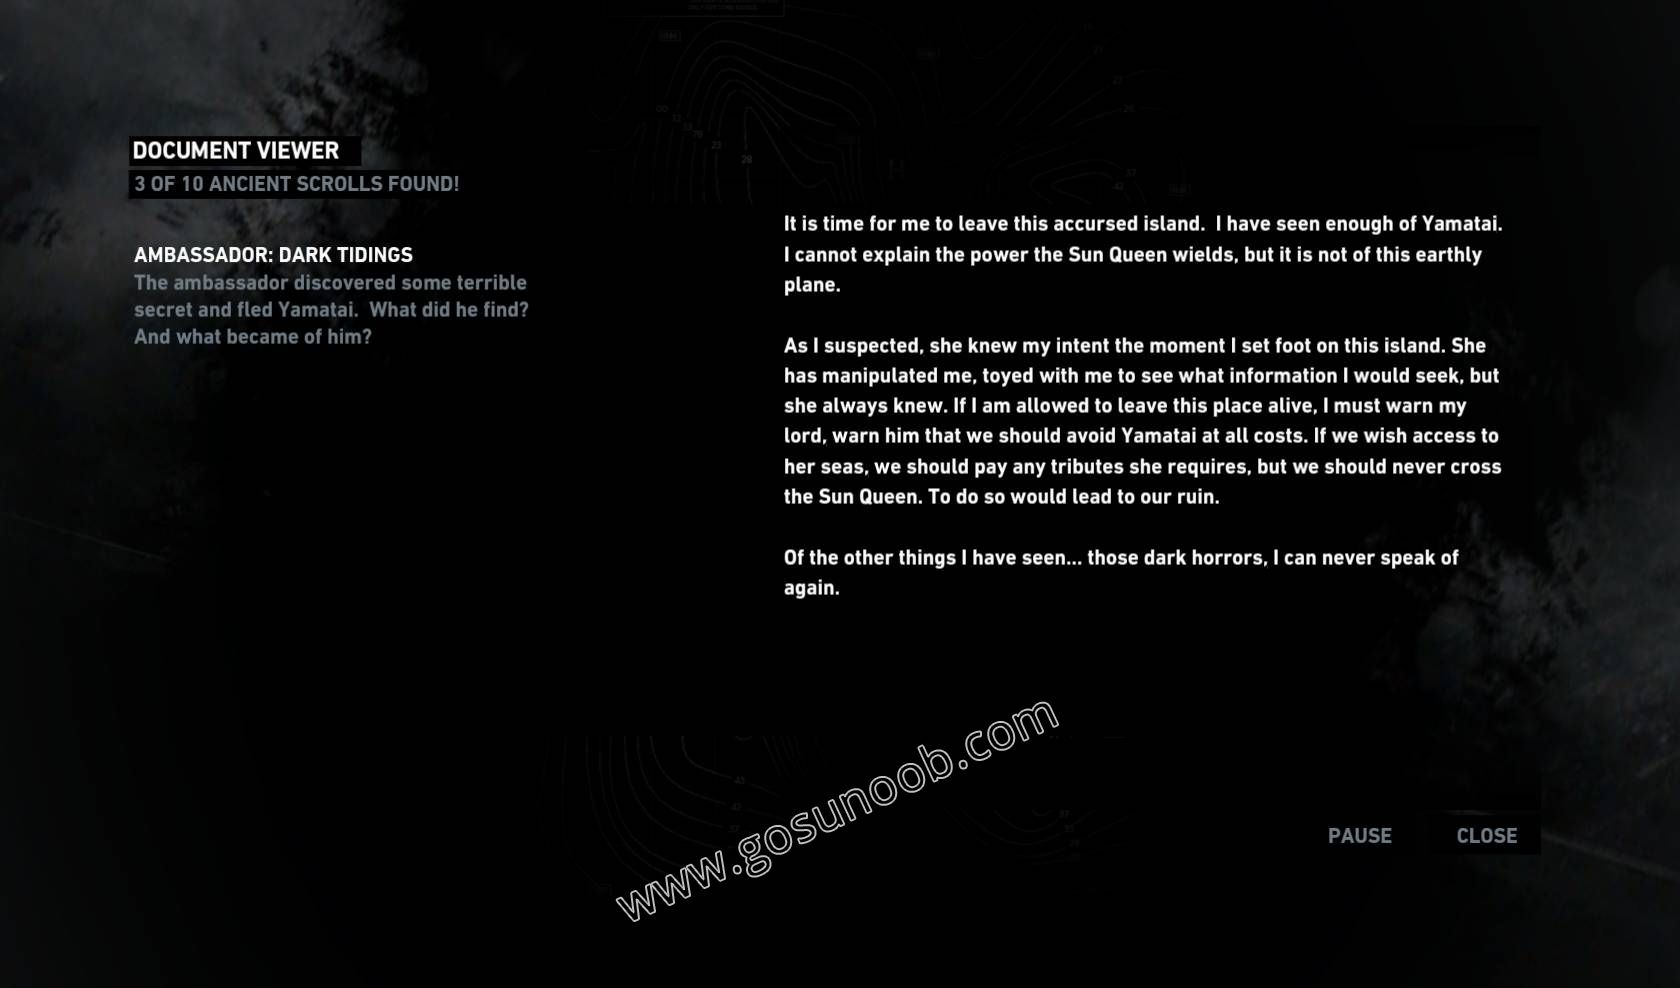 Ancient Scrolls - Ambassador: Dark Tidings - GosuNoob.com Video Game ...